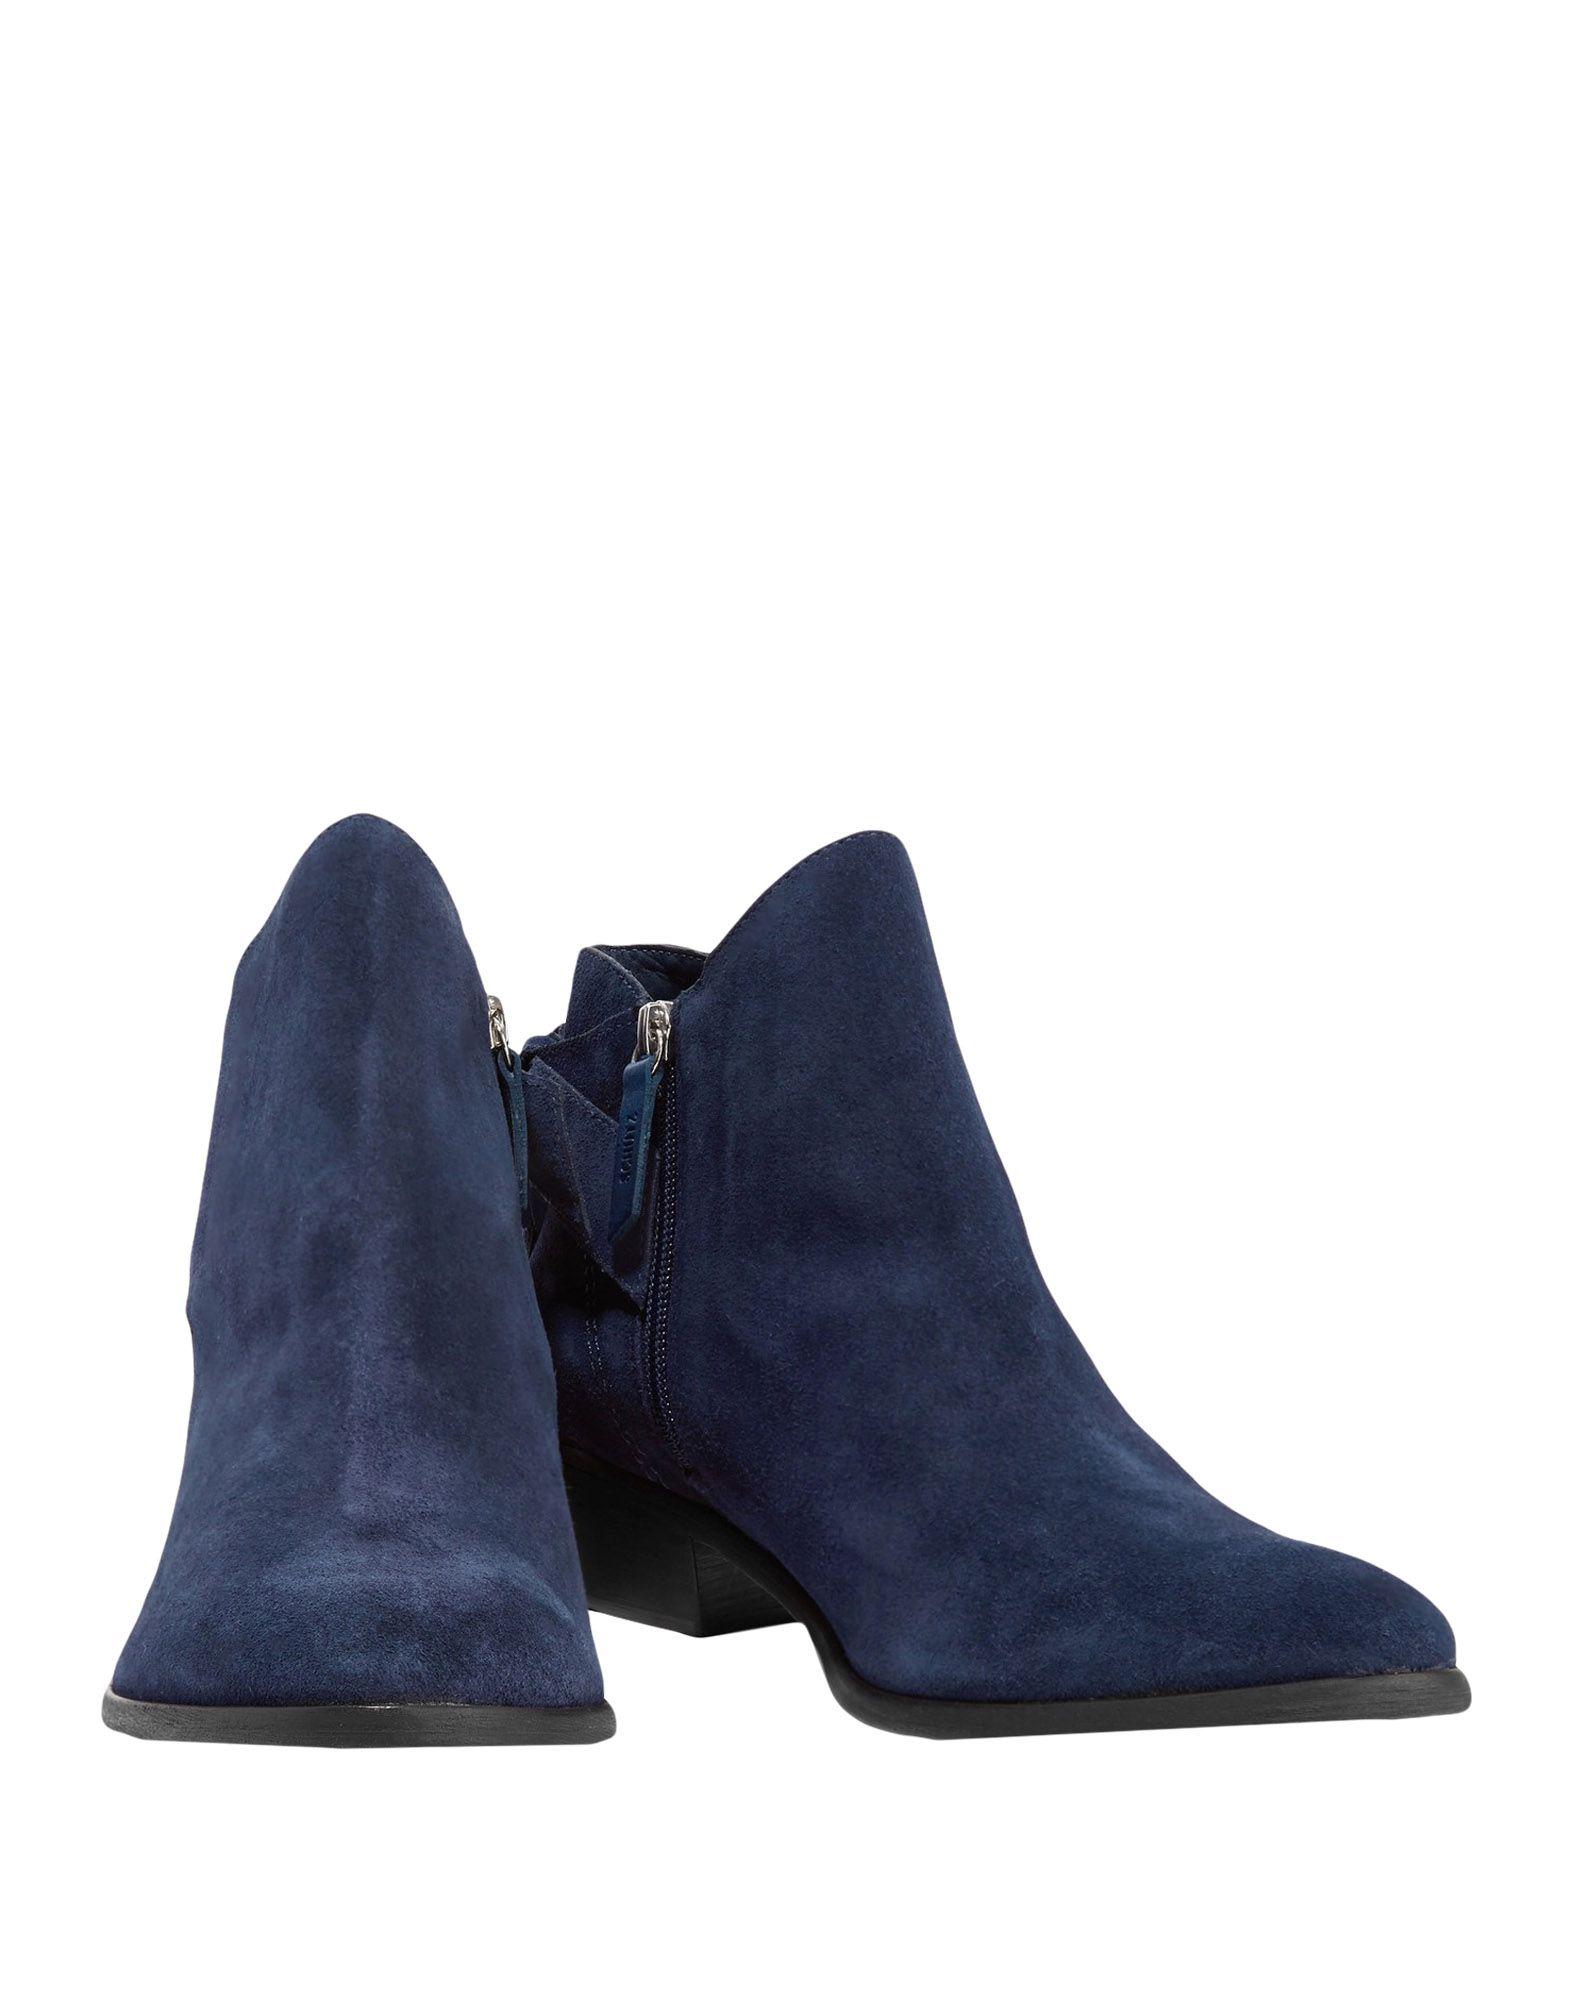 Schutz Ankle Ankle Boot - Women Schutz Ankle Ankle Boots online on  Australia - 11463764AV 2549d8